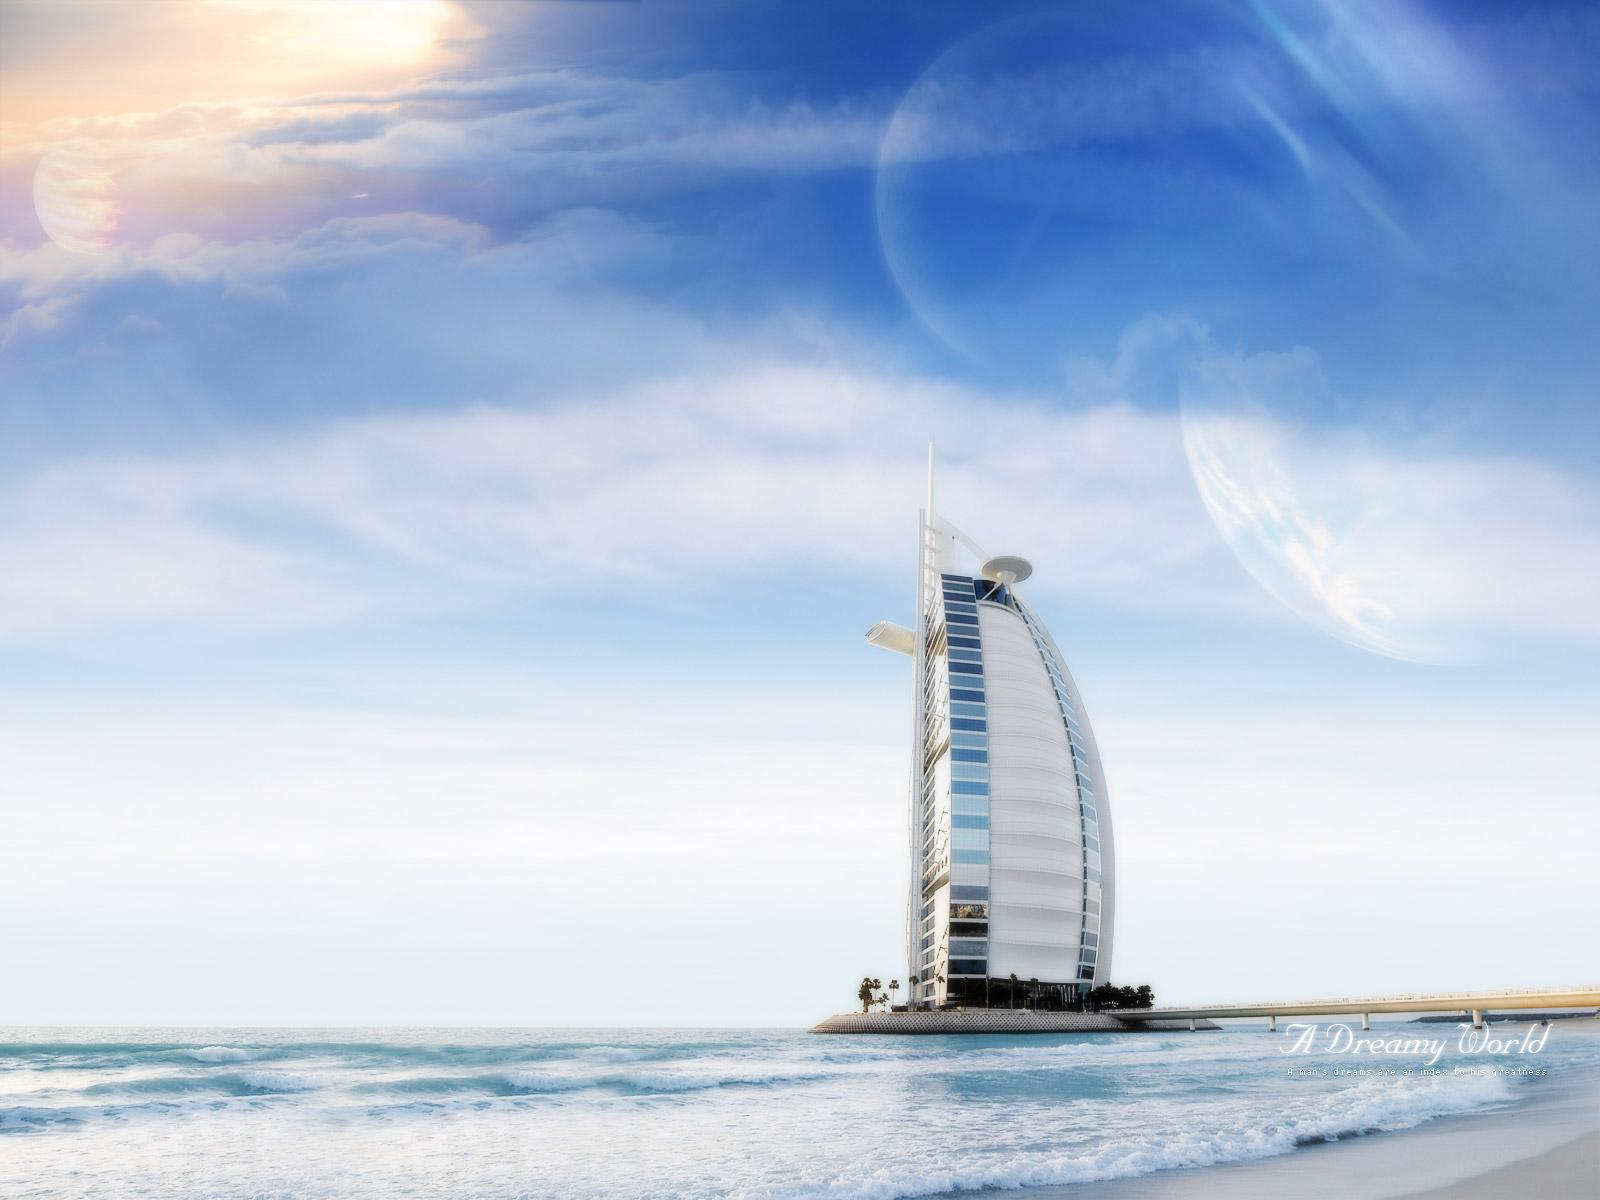 World Visits: Dubai Wallpaper Images Review